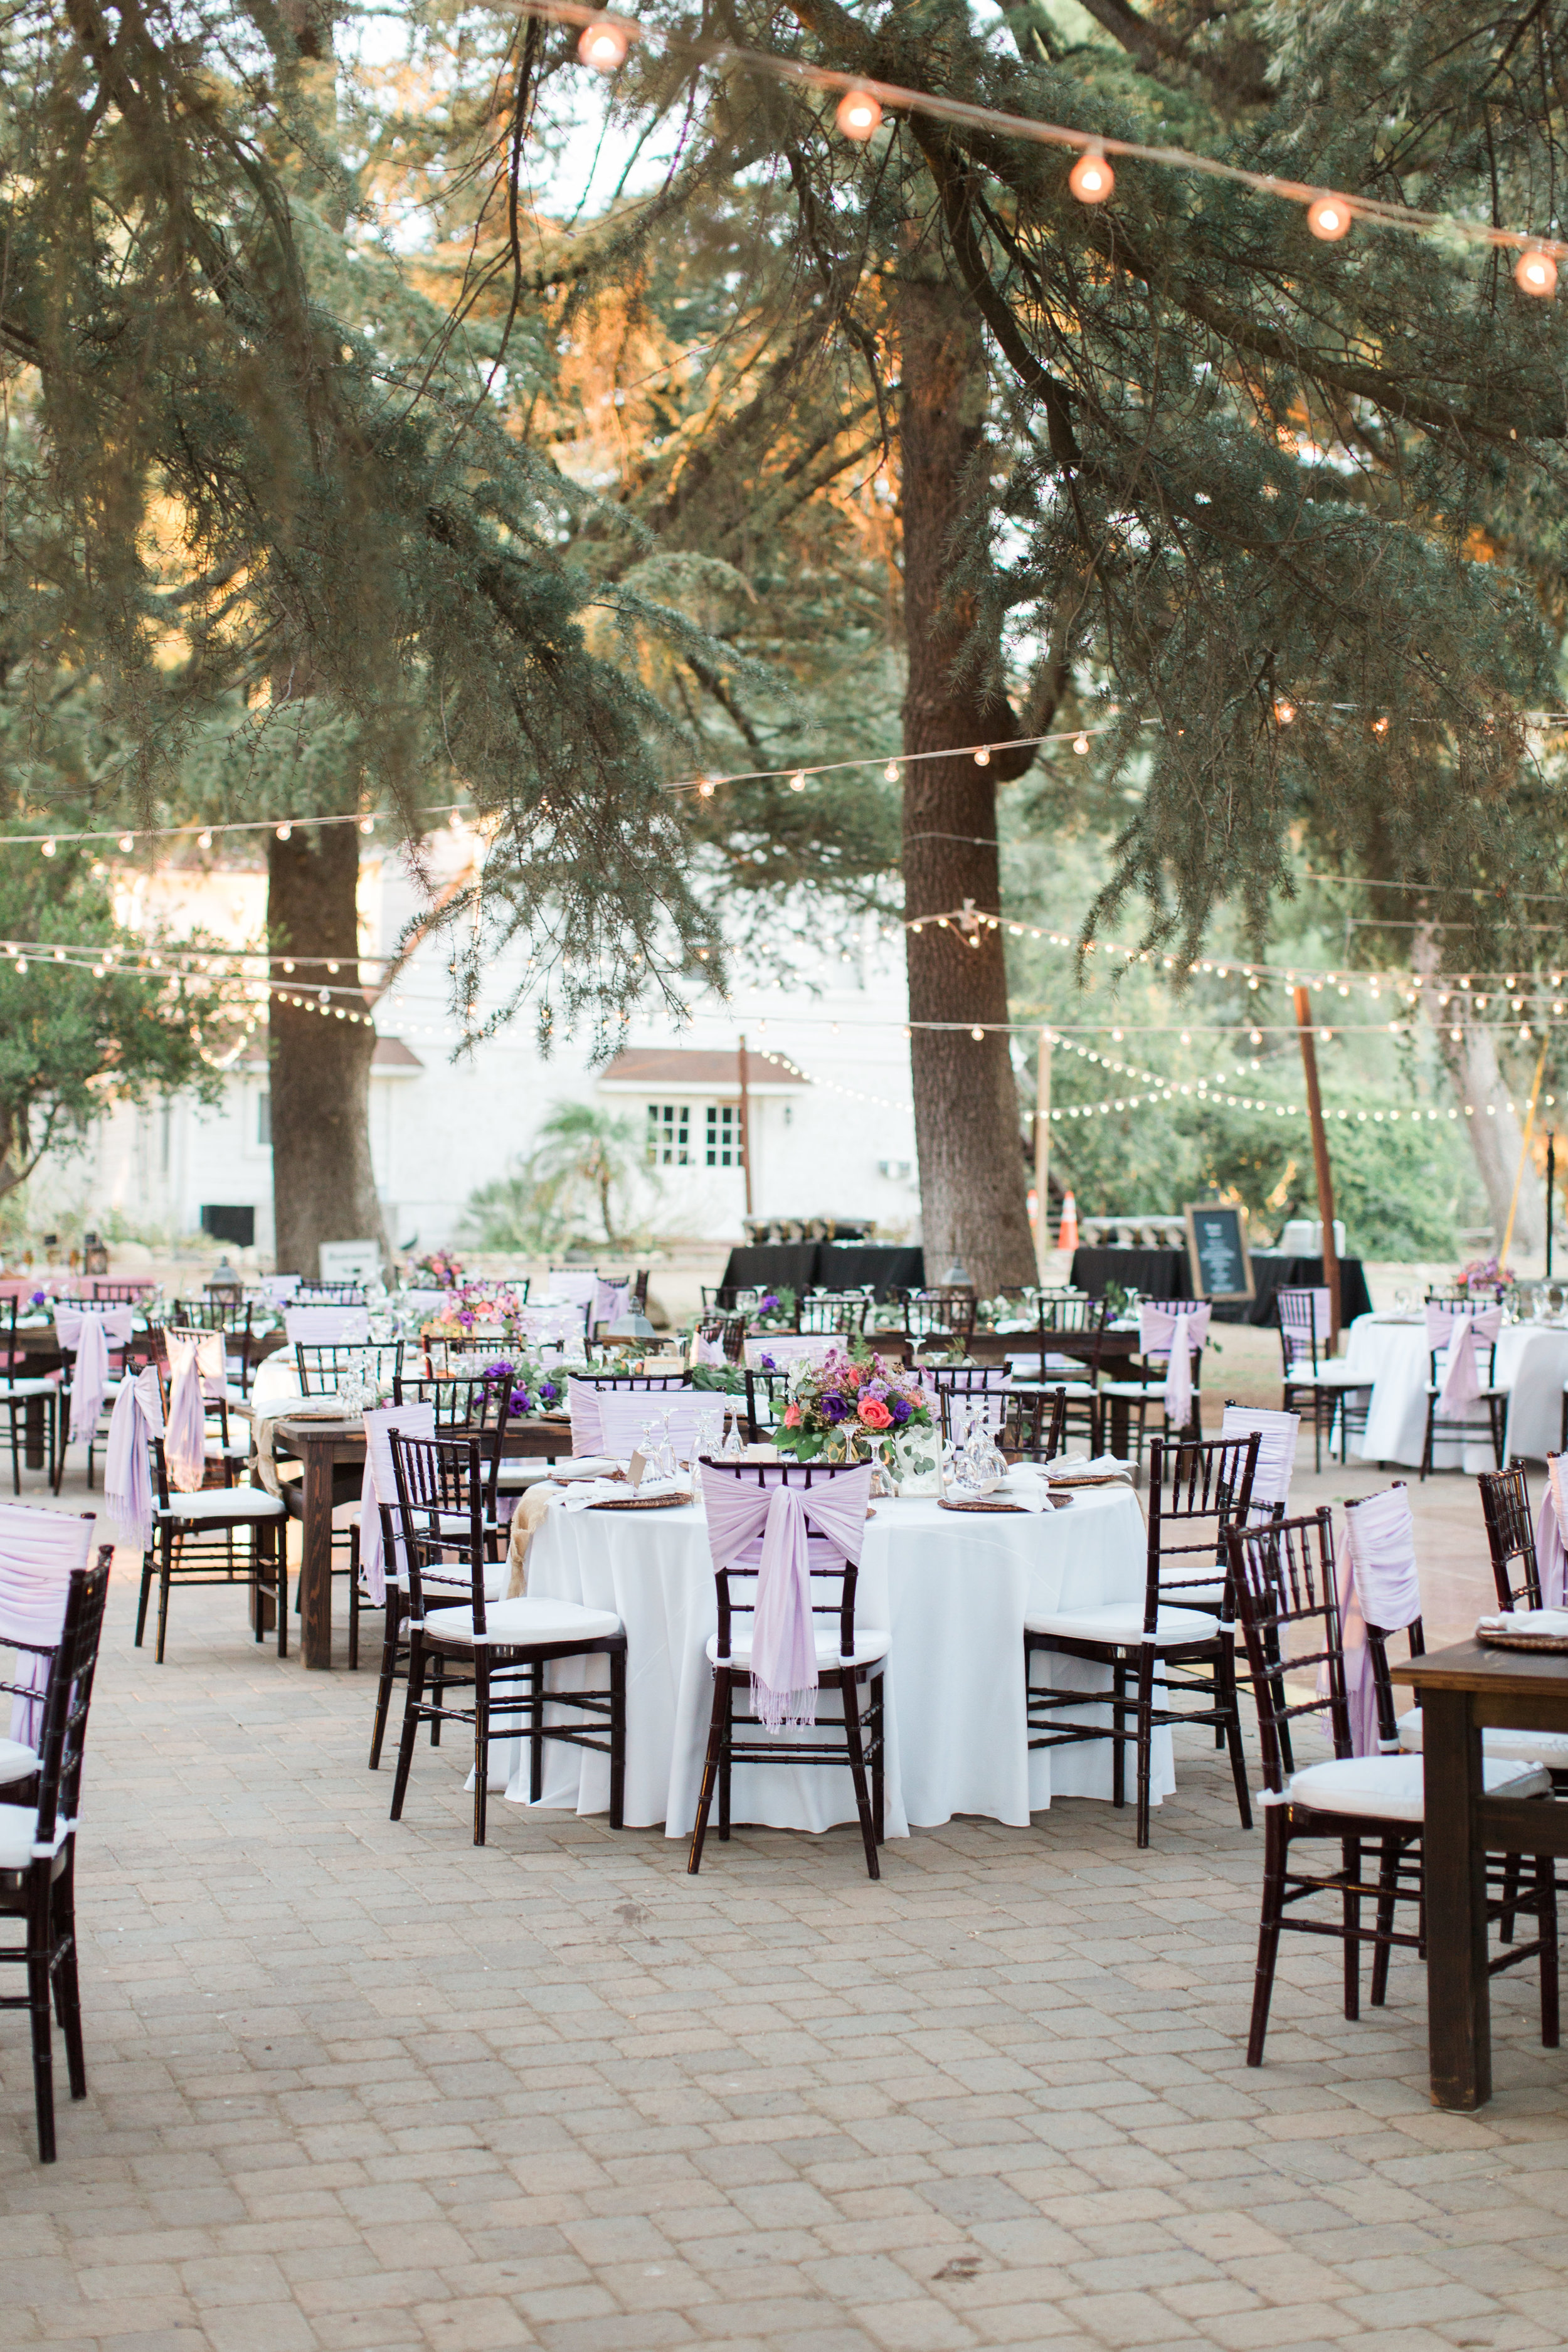 Jenny Quicksall Photography_www.jennyquicksall.com_California Wedding Photographer_Highland Springs Ranch and Inn Resort_Cherry Valley California (57).JPG